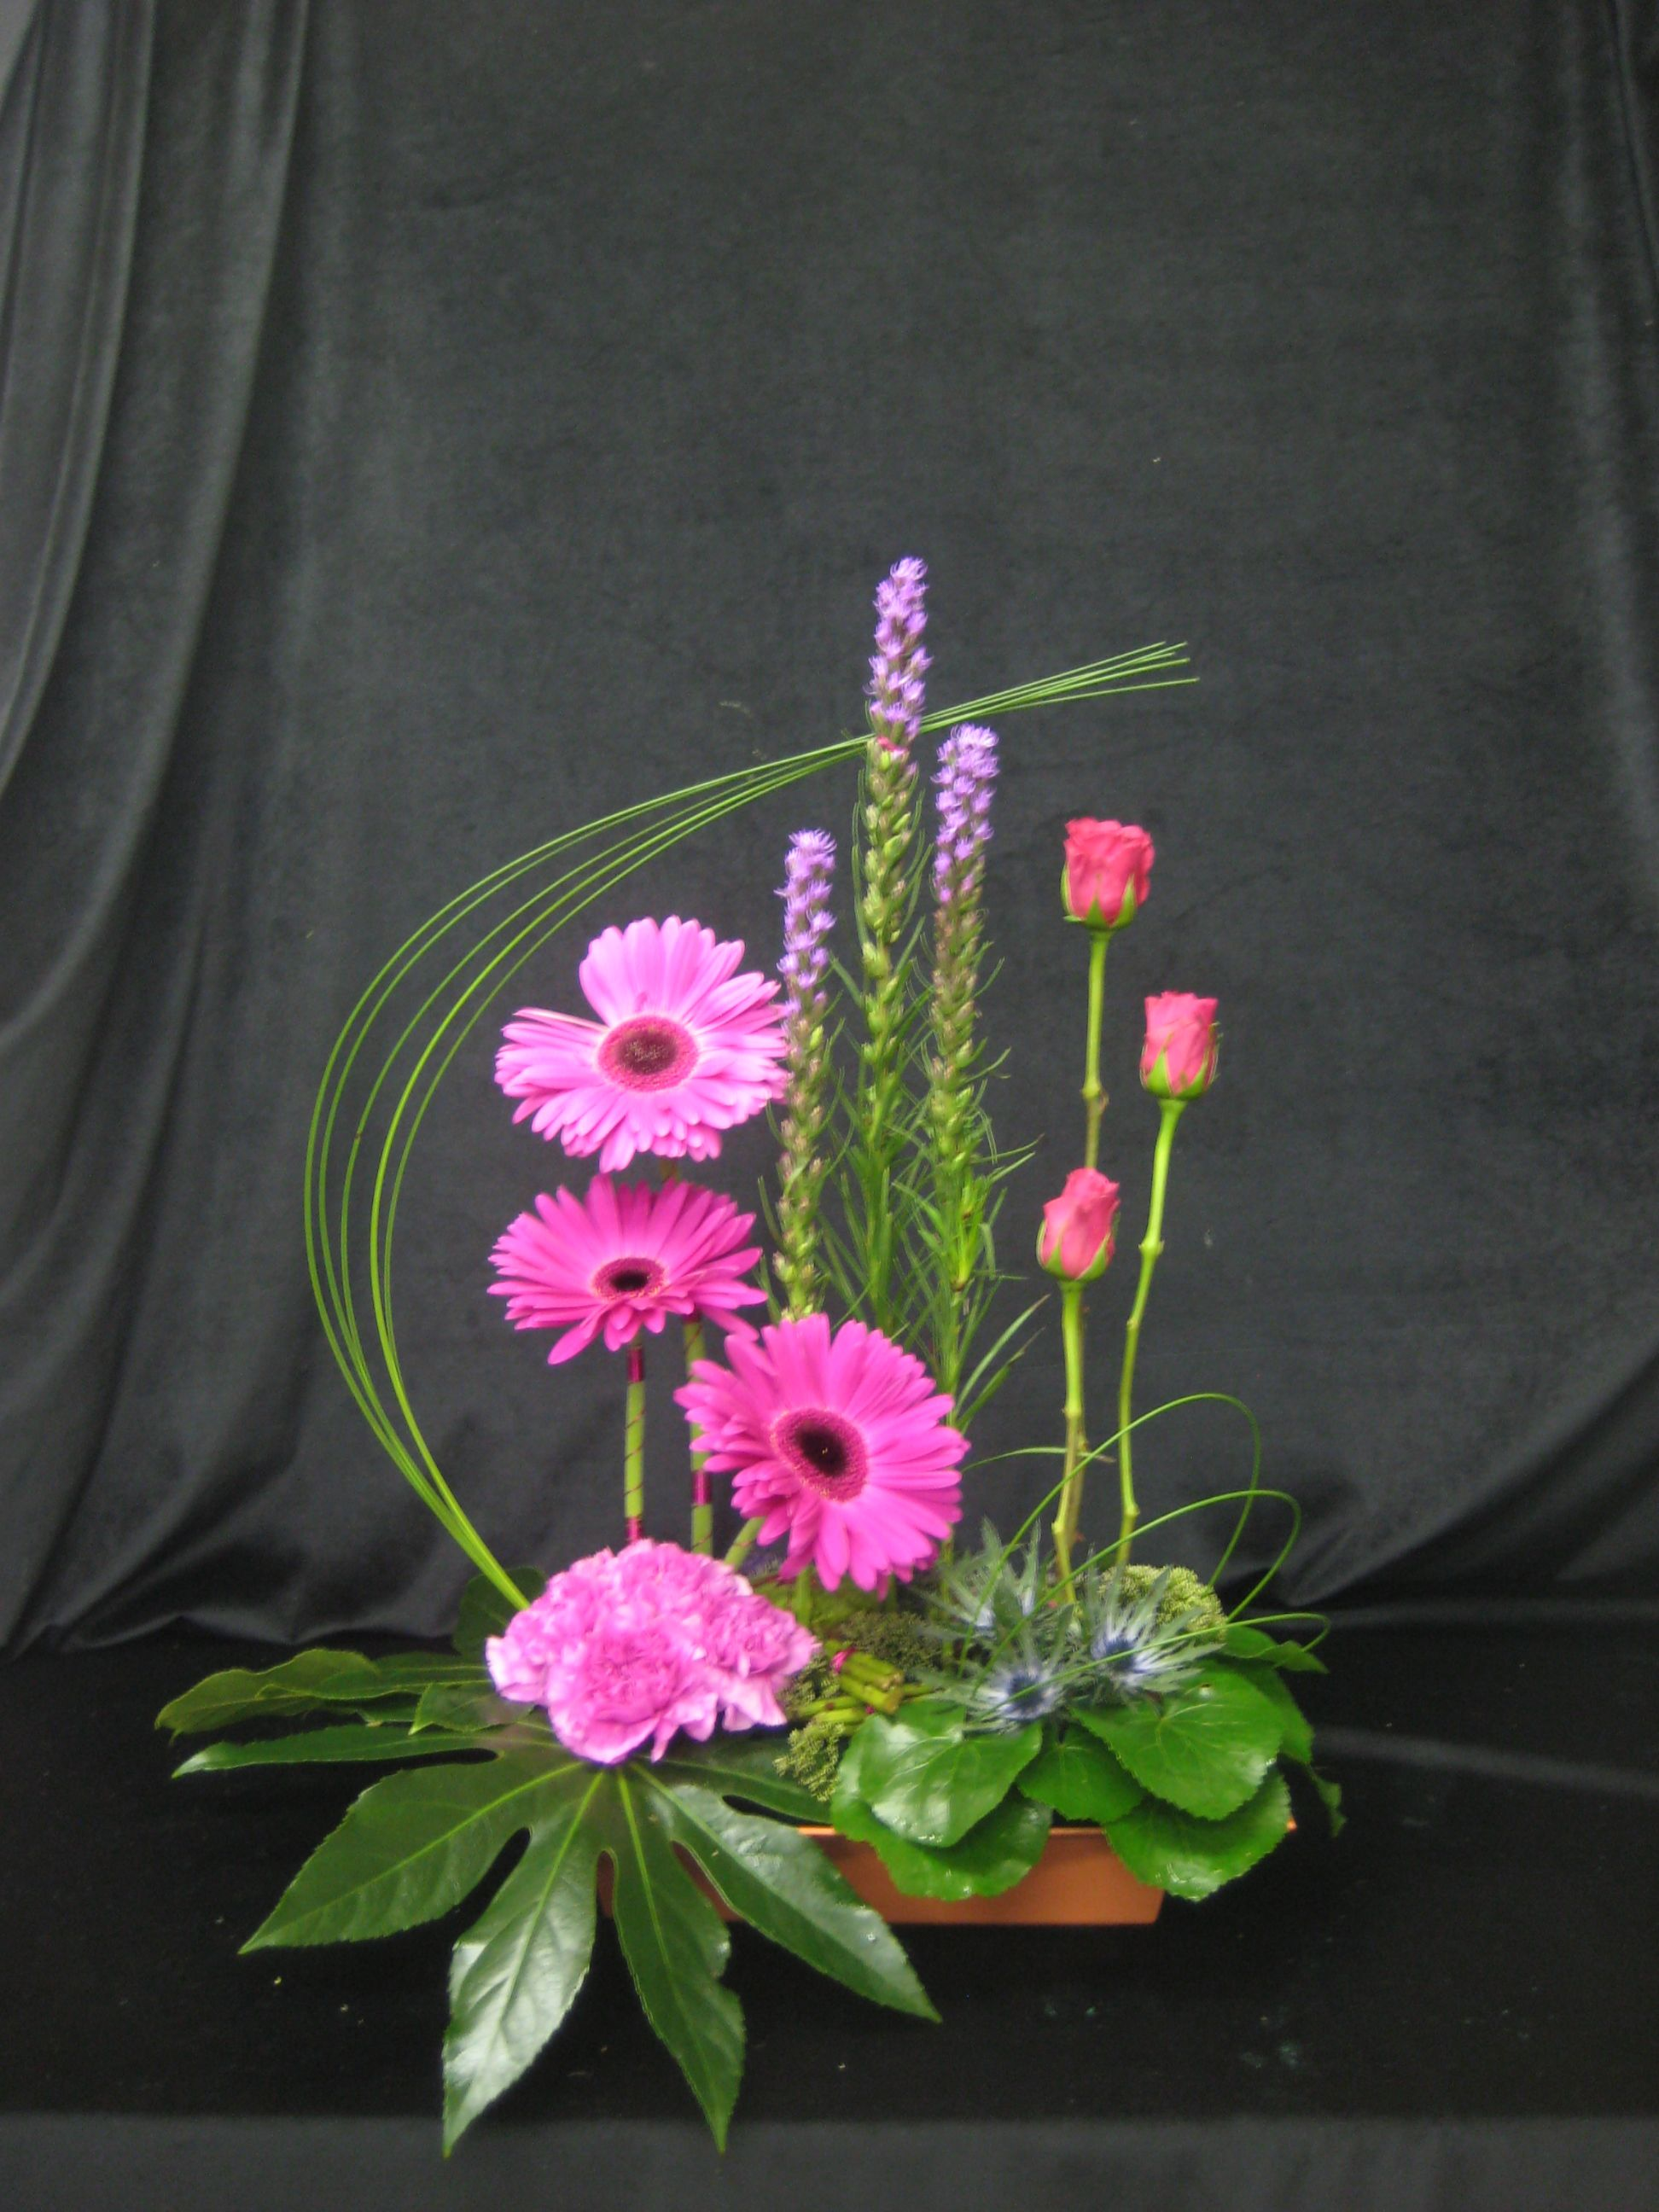 Designer Floral Arrangements  Contemporary Vertical Designs  Florals  Contemporary